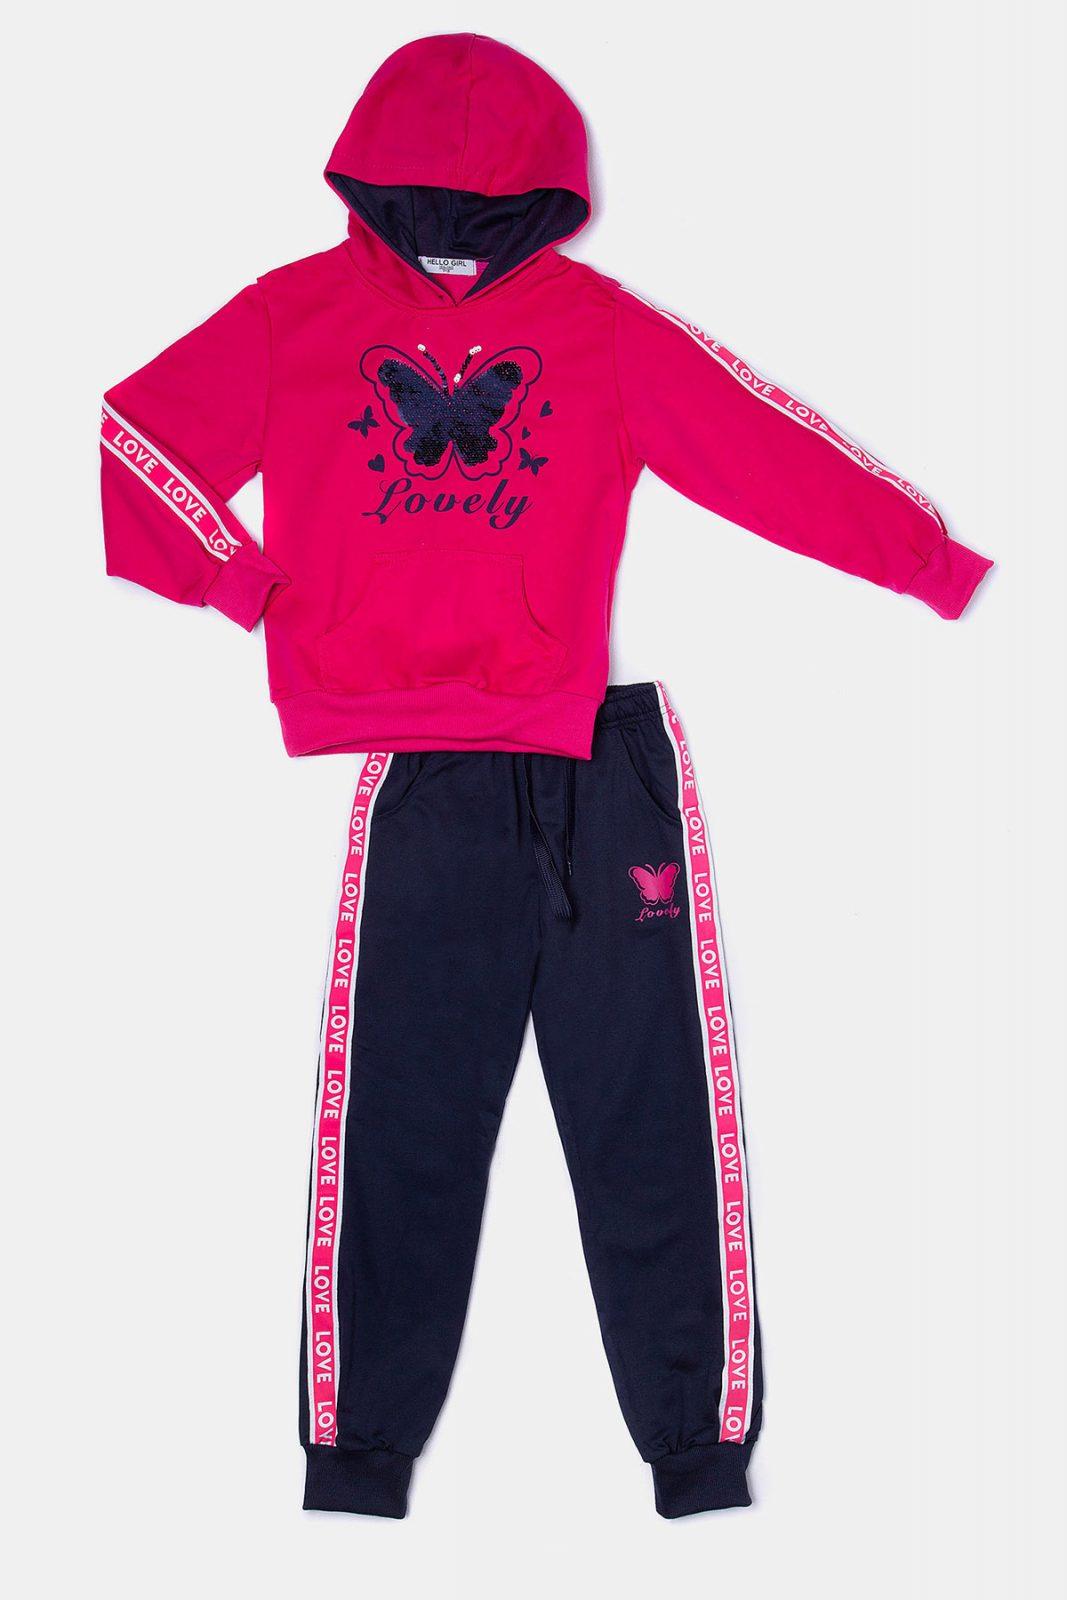 be3b59cdc86 Φόρμα πεταλούδα φούξια με πούλιες - Ersas Παιδικά, Βρεφικά Ρούχα